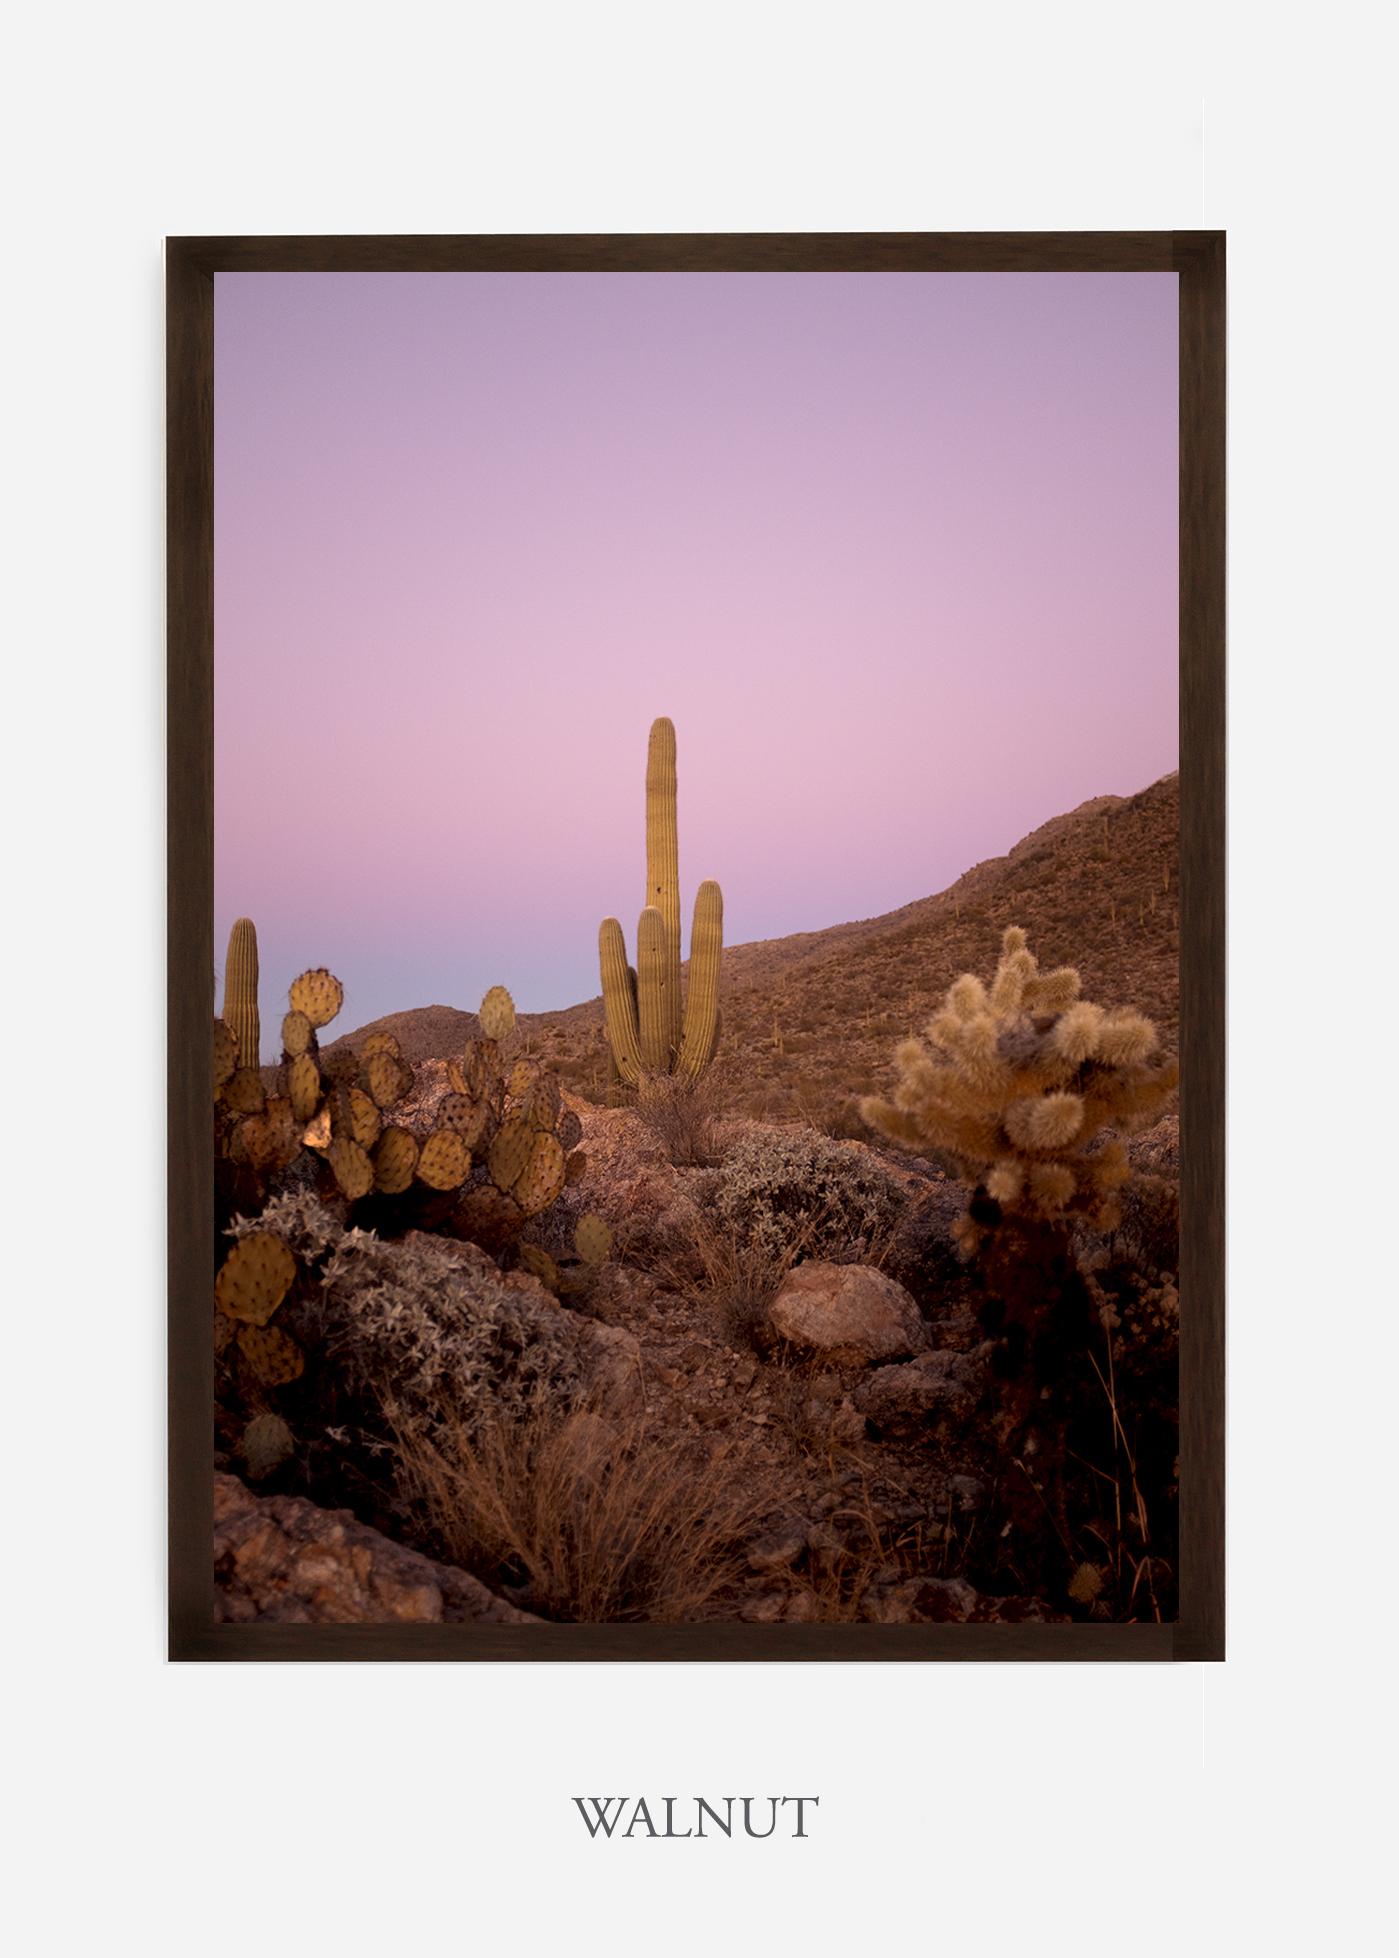 nomat-walnutframe-saguaroNo.10-wildercalifornia-art-wallart-cactusprint-homedecor-prints-arizona-botanical-artwork-interiordesign.jpg